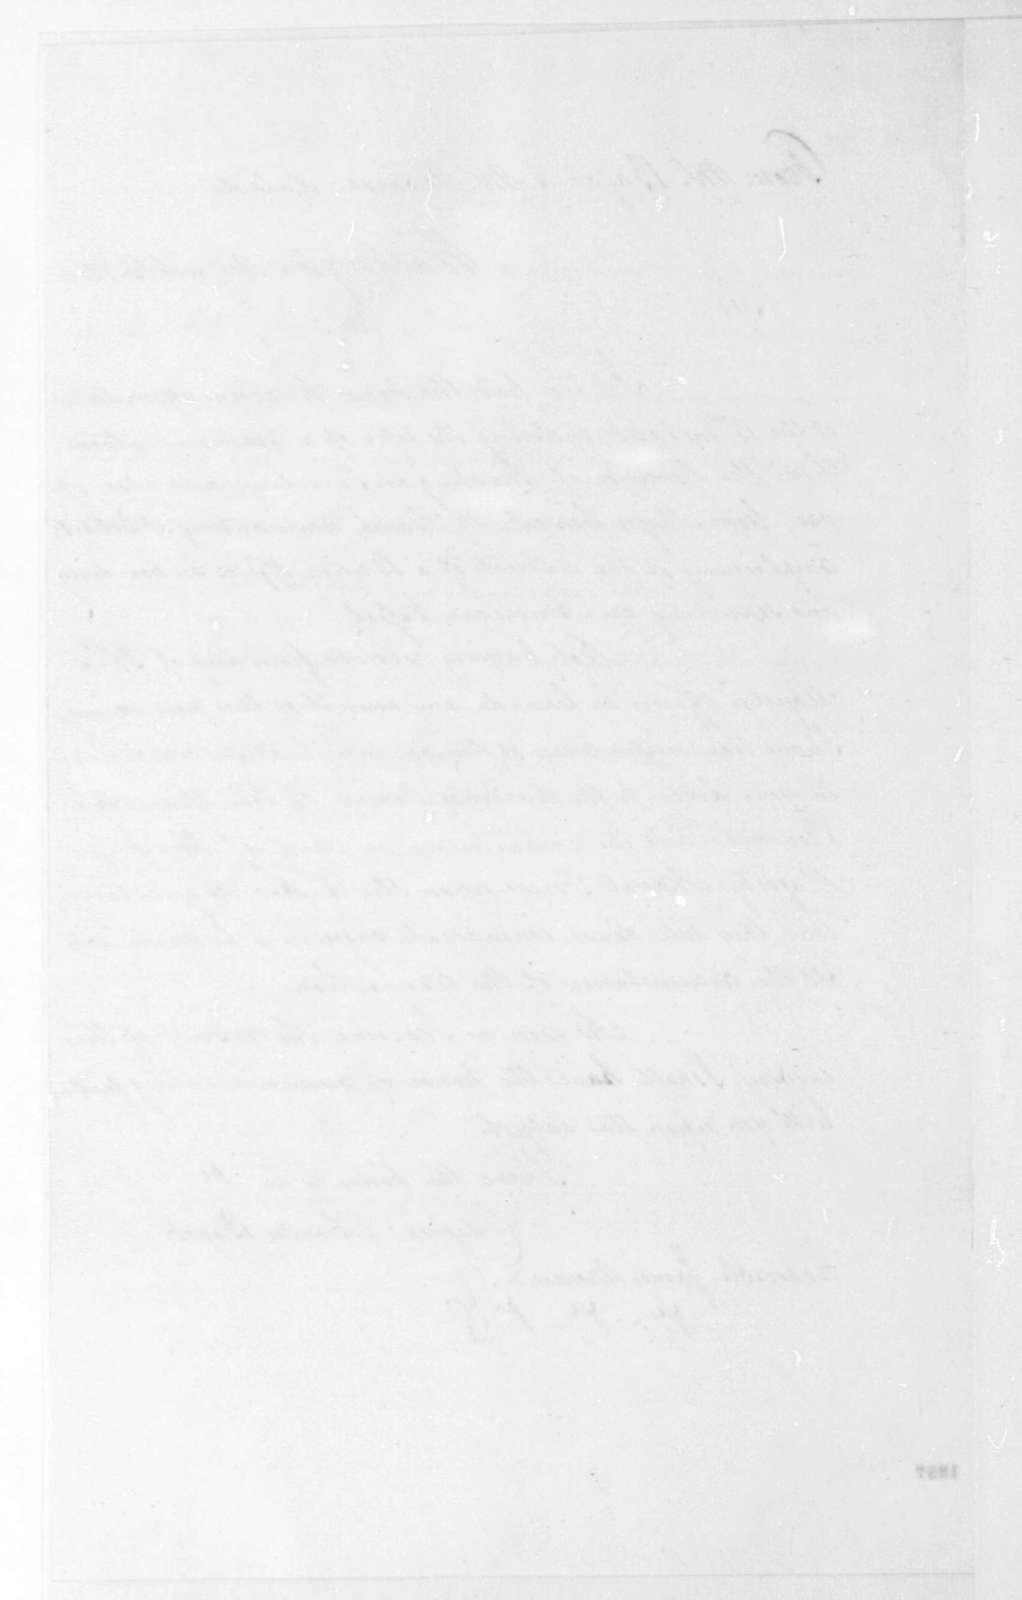 Charles Bagot to James Monroe, August 16, 1816.